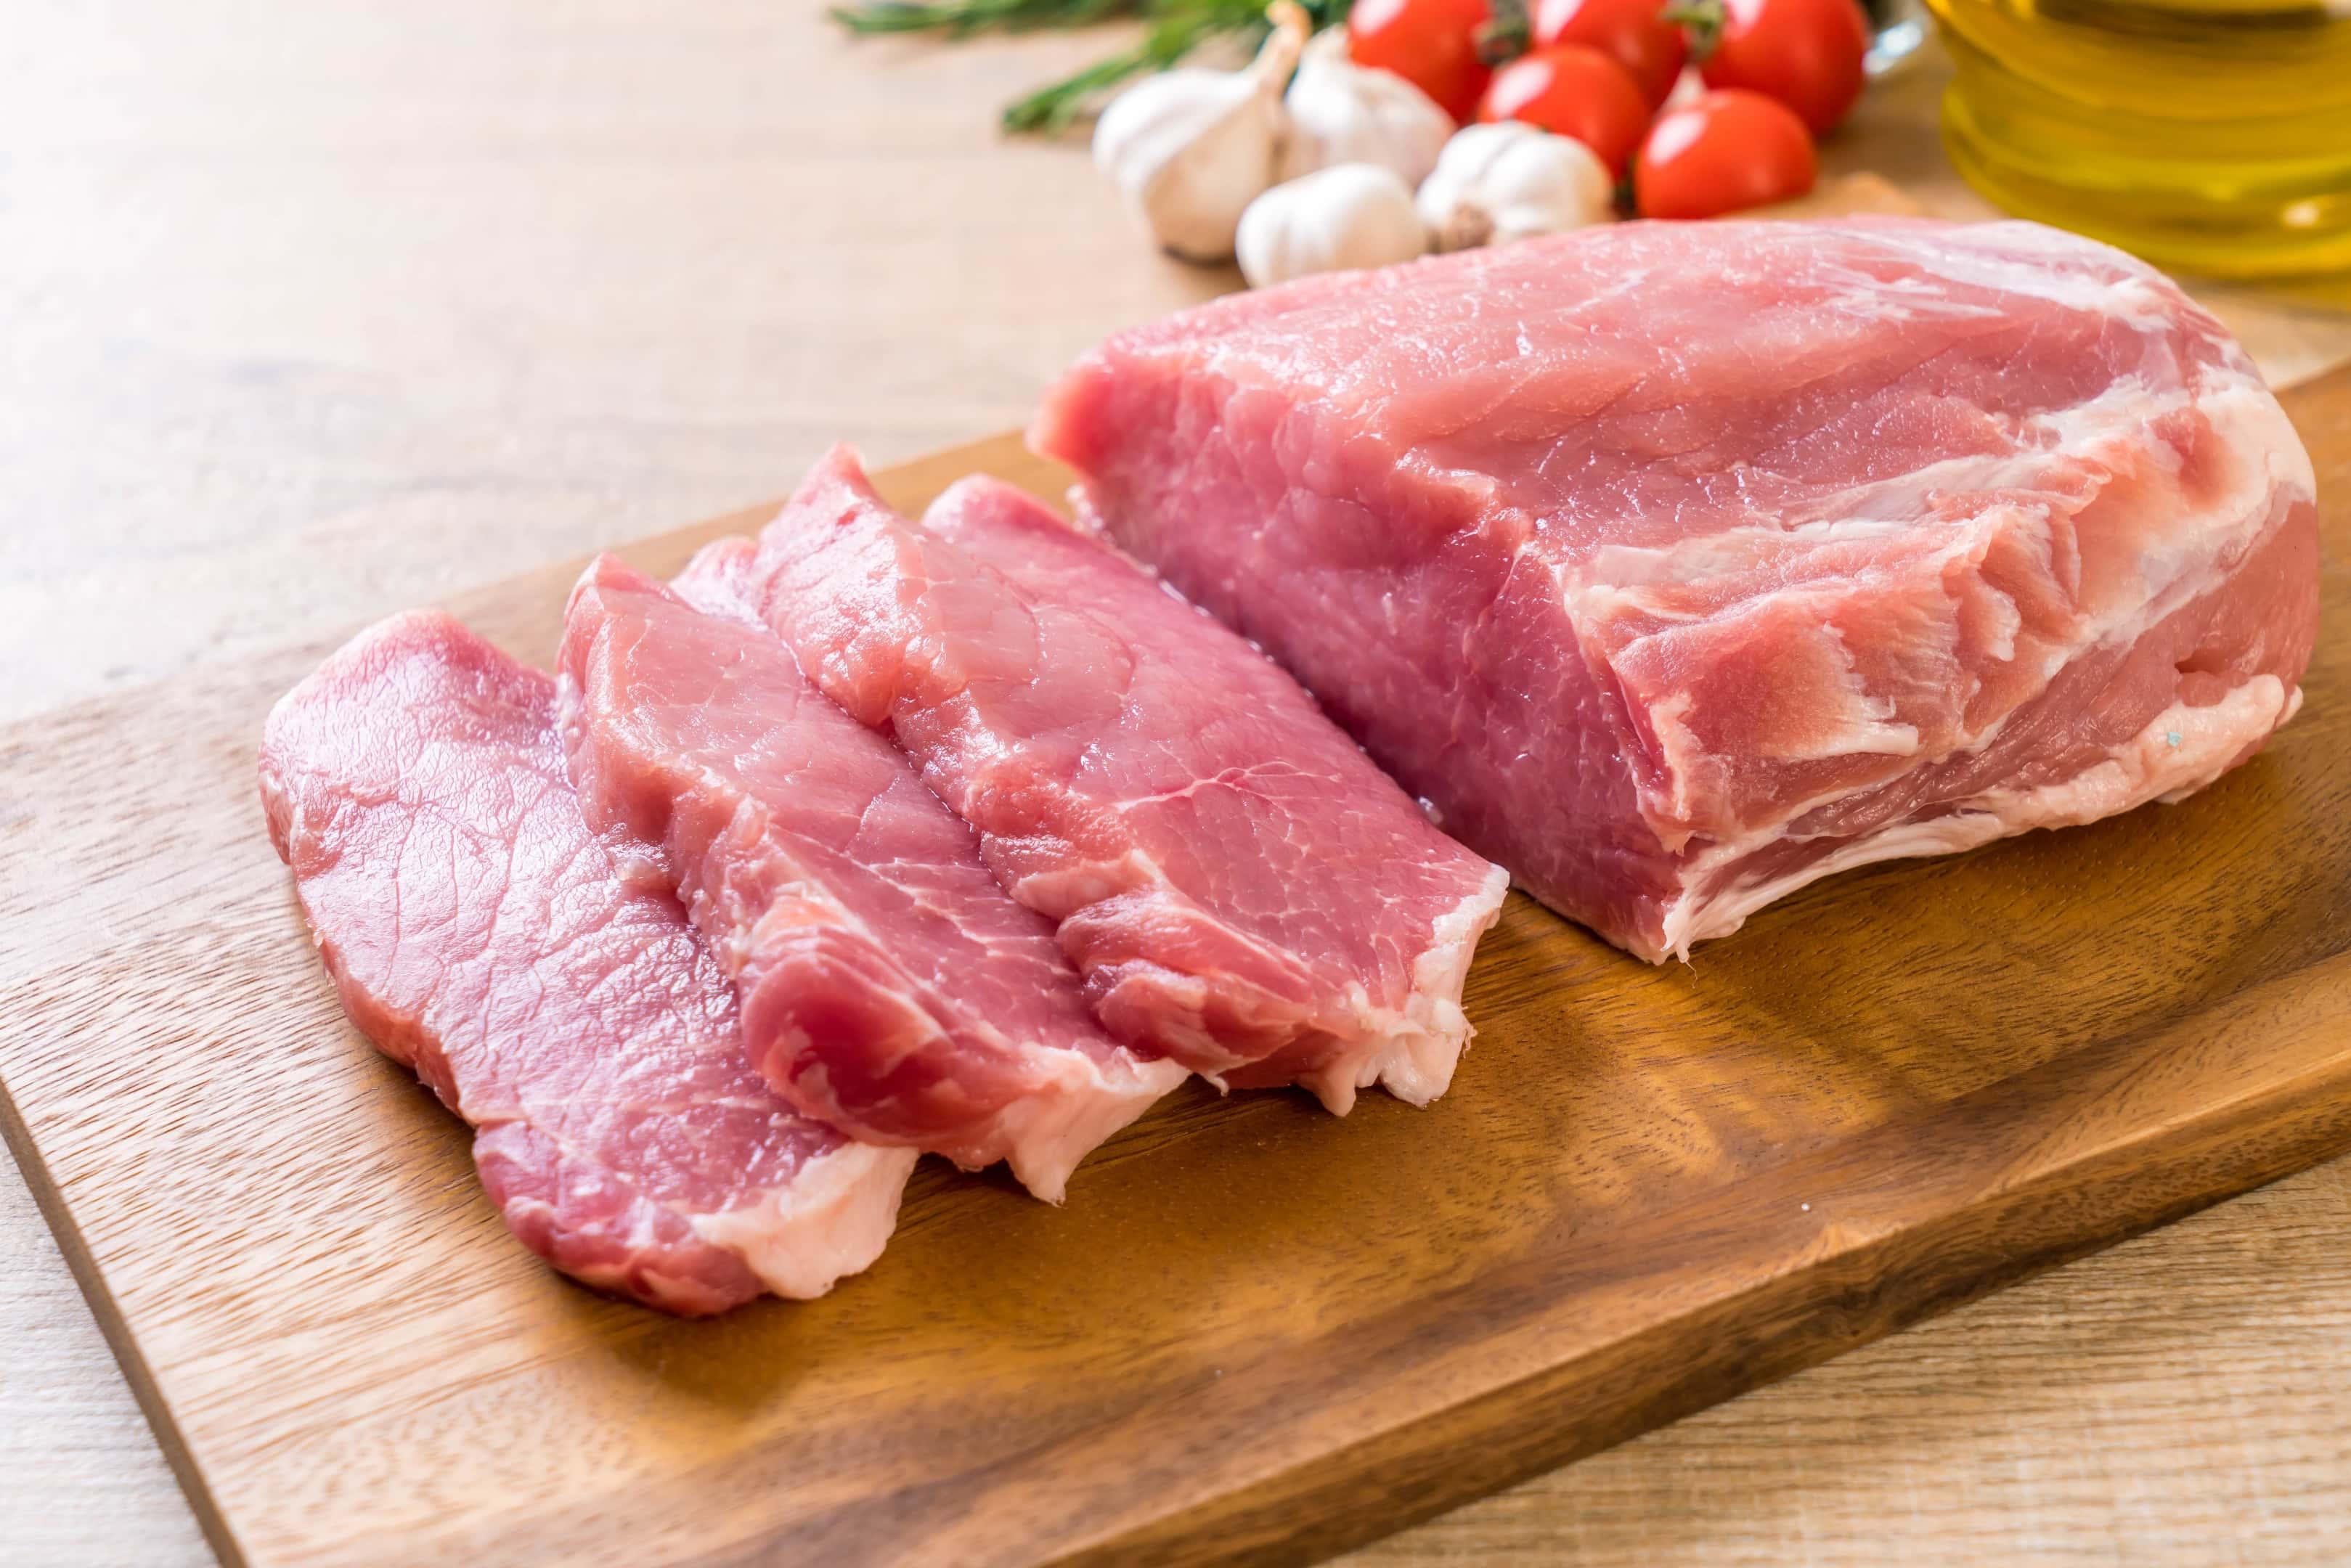 Fresh pork raw fillet on wooden board